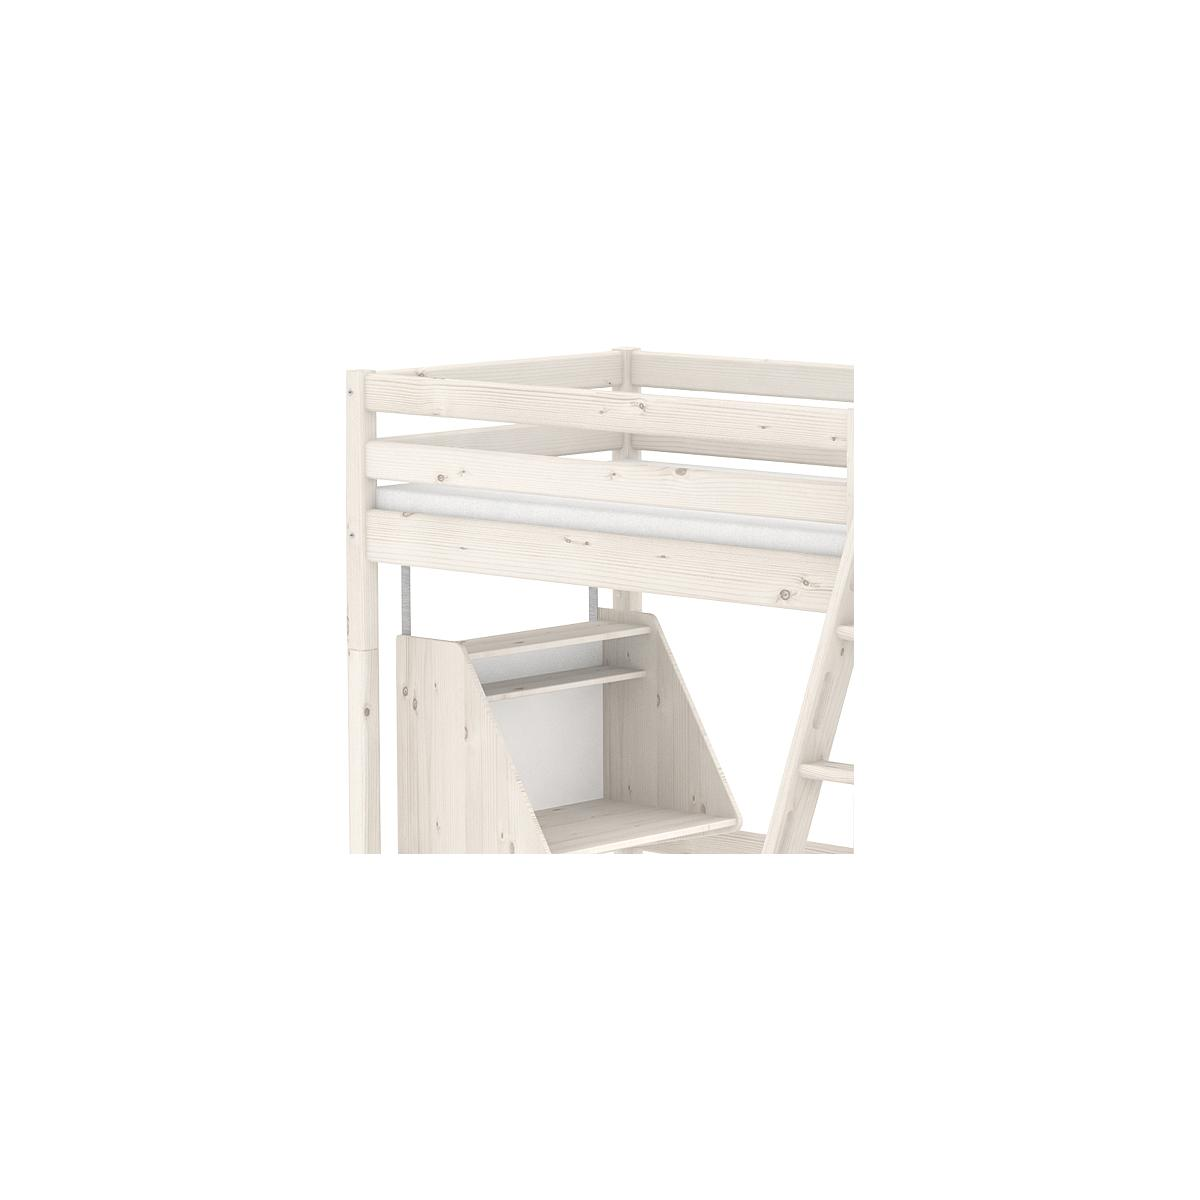 Cama alta Casa 90x200 CLASSIC Flexa escalera inclinada blanco cal